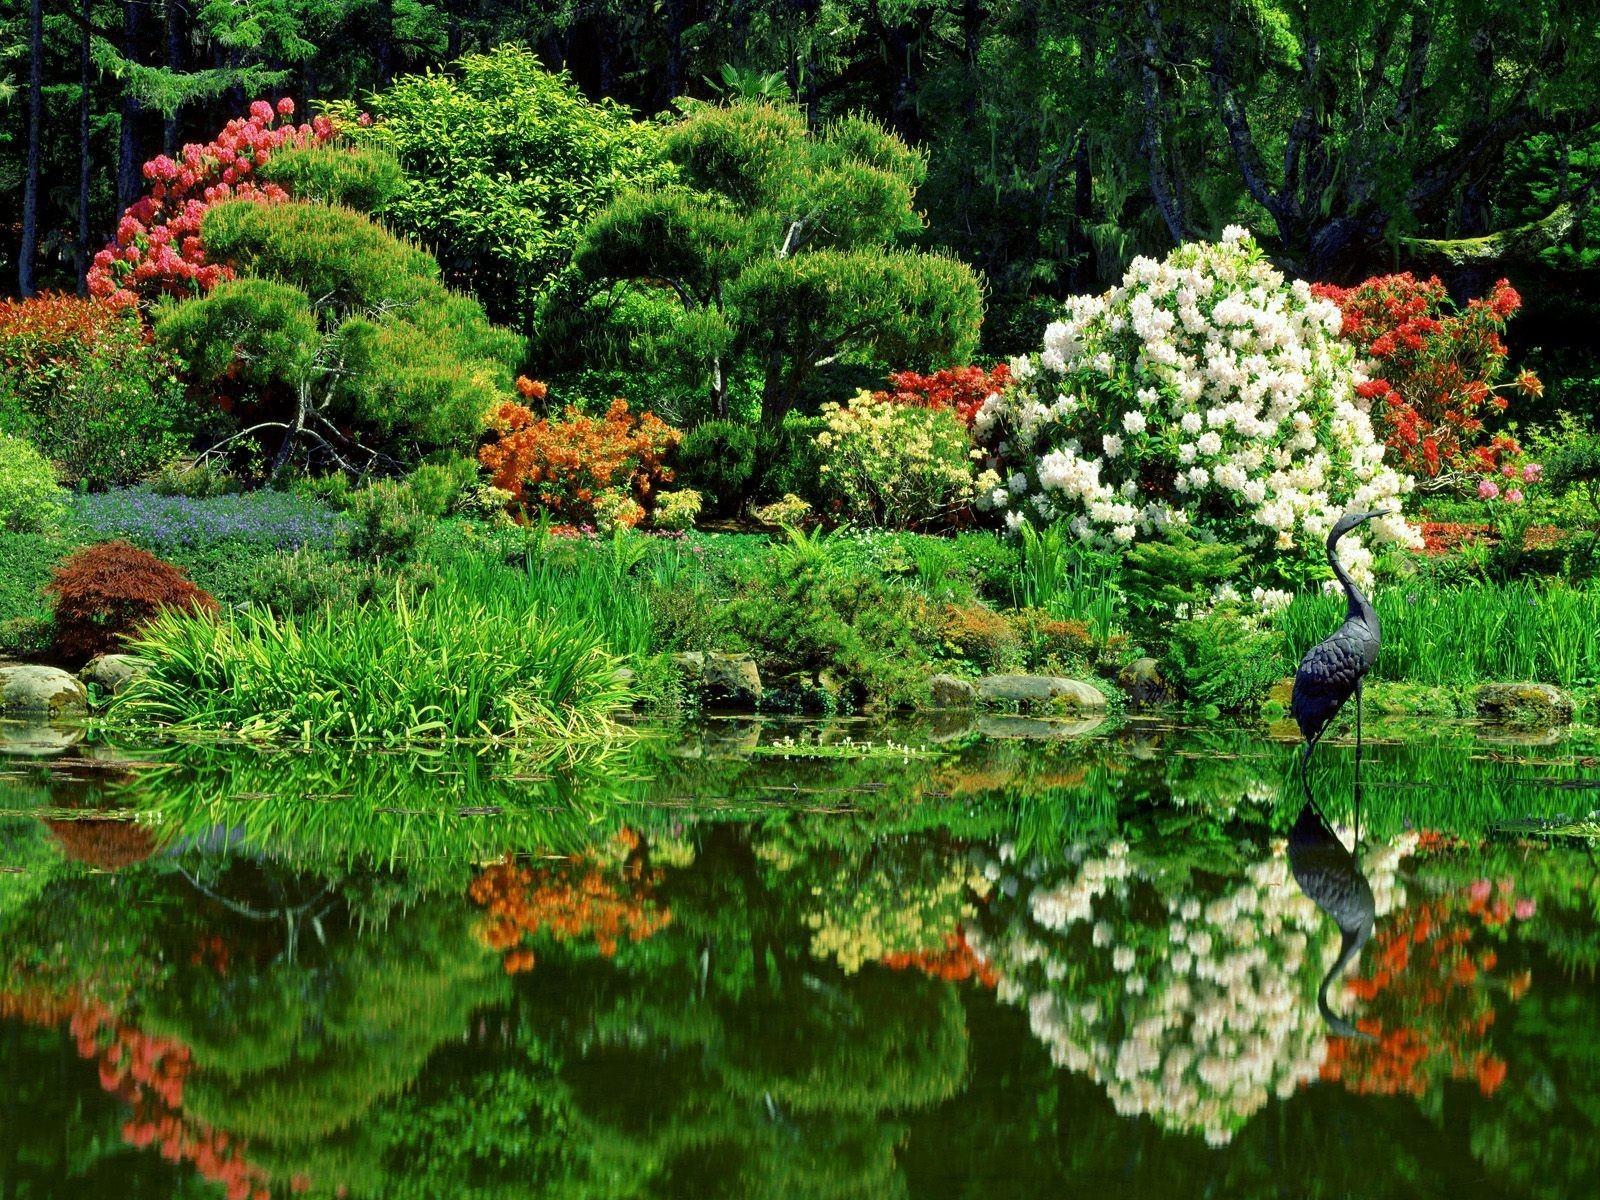 Азиатский сад обои 1600x1200.  Фруктовый Сад Обои